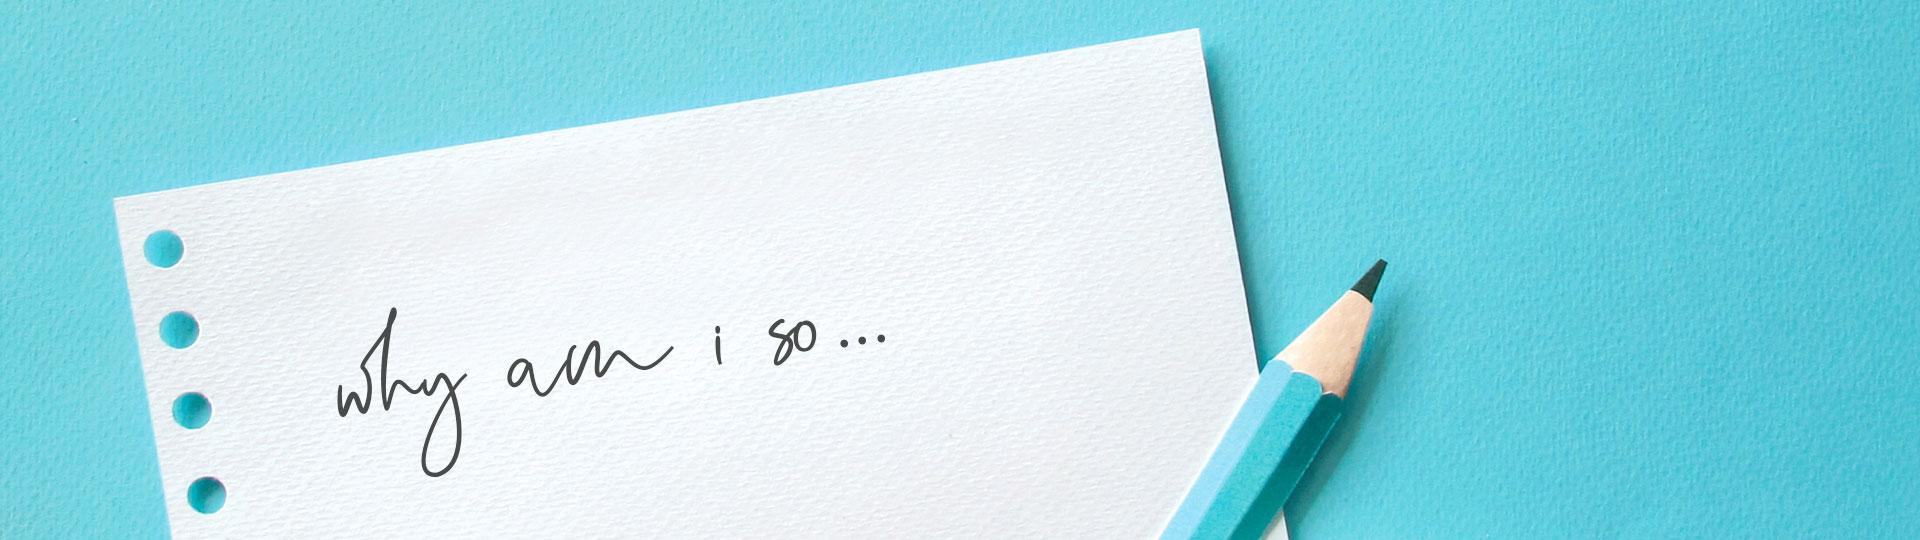 why-am-i-so-...-blog-series.jpg